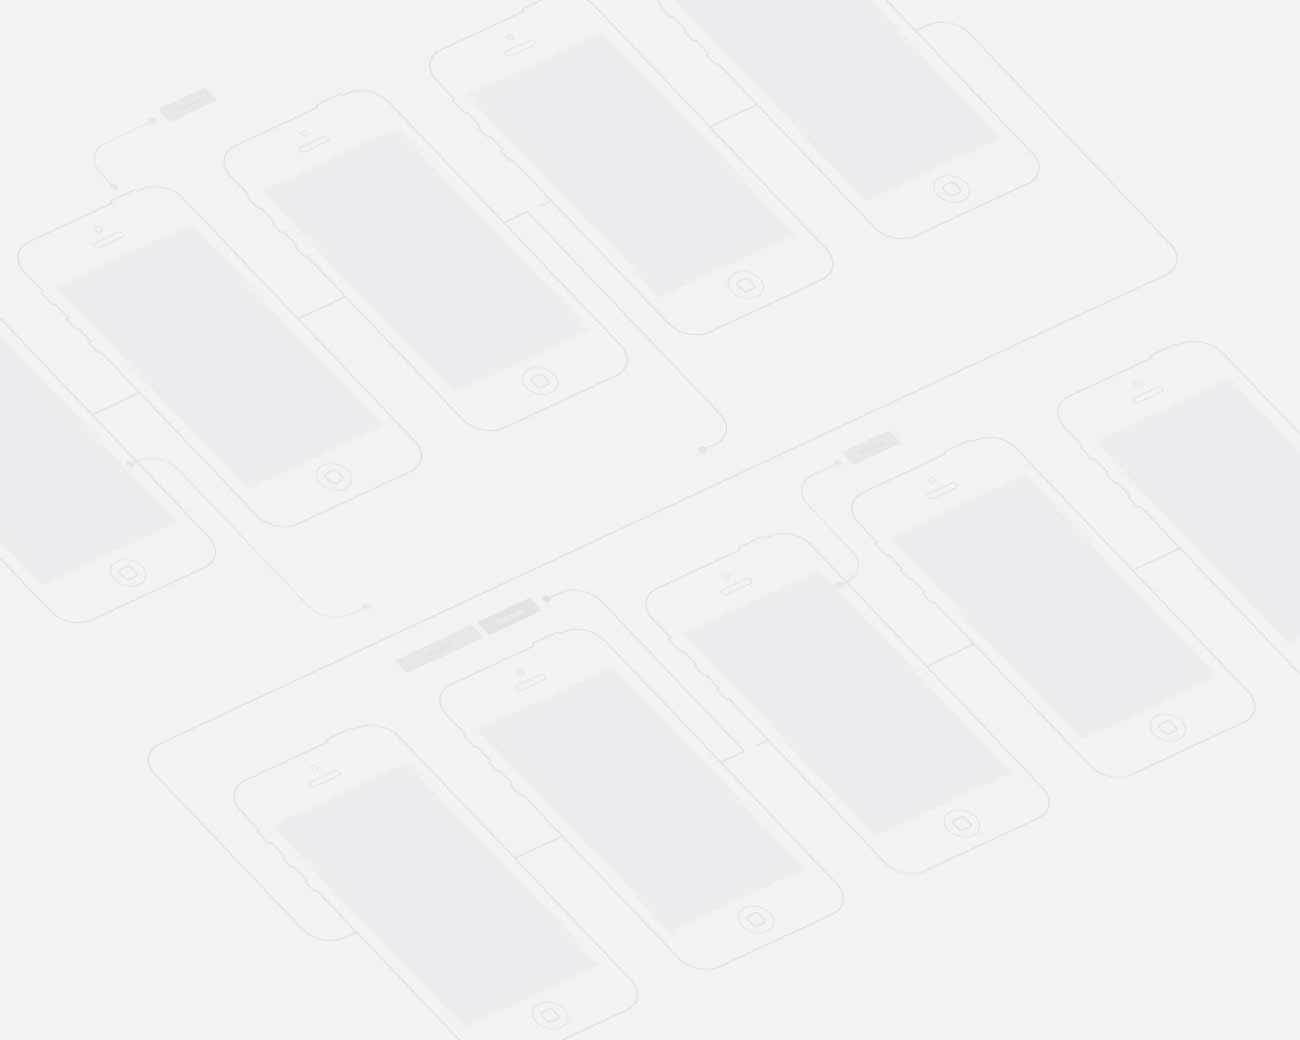 mobile_app_bkgd2_xml